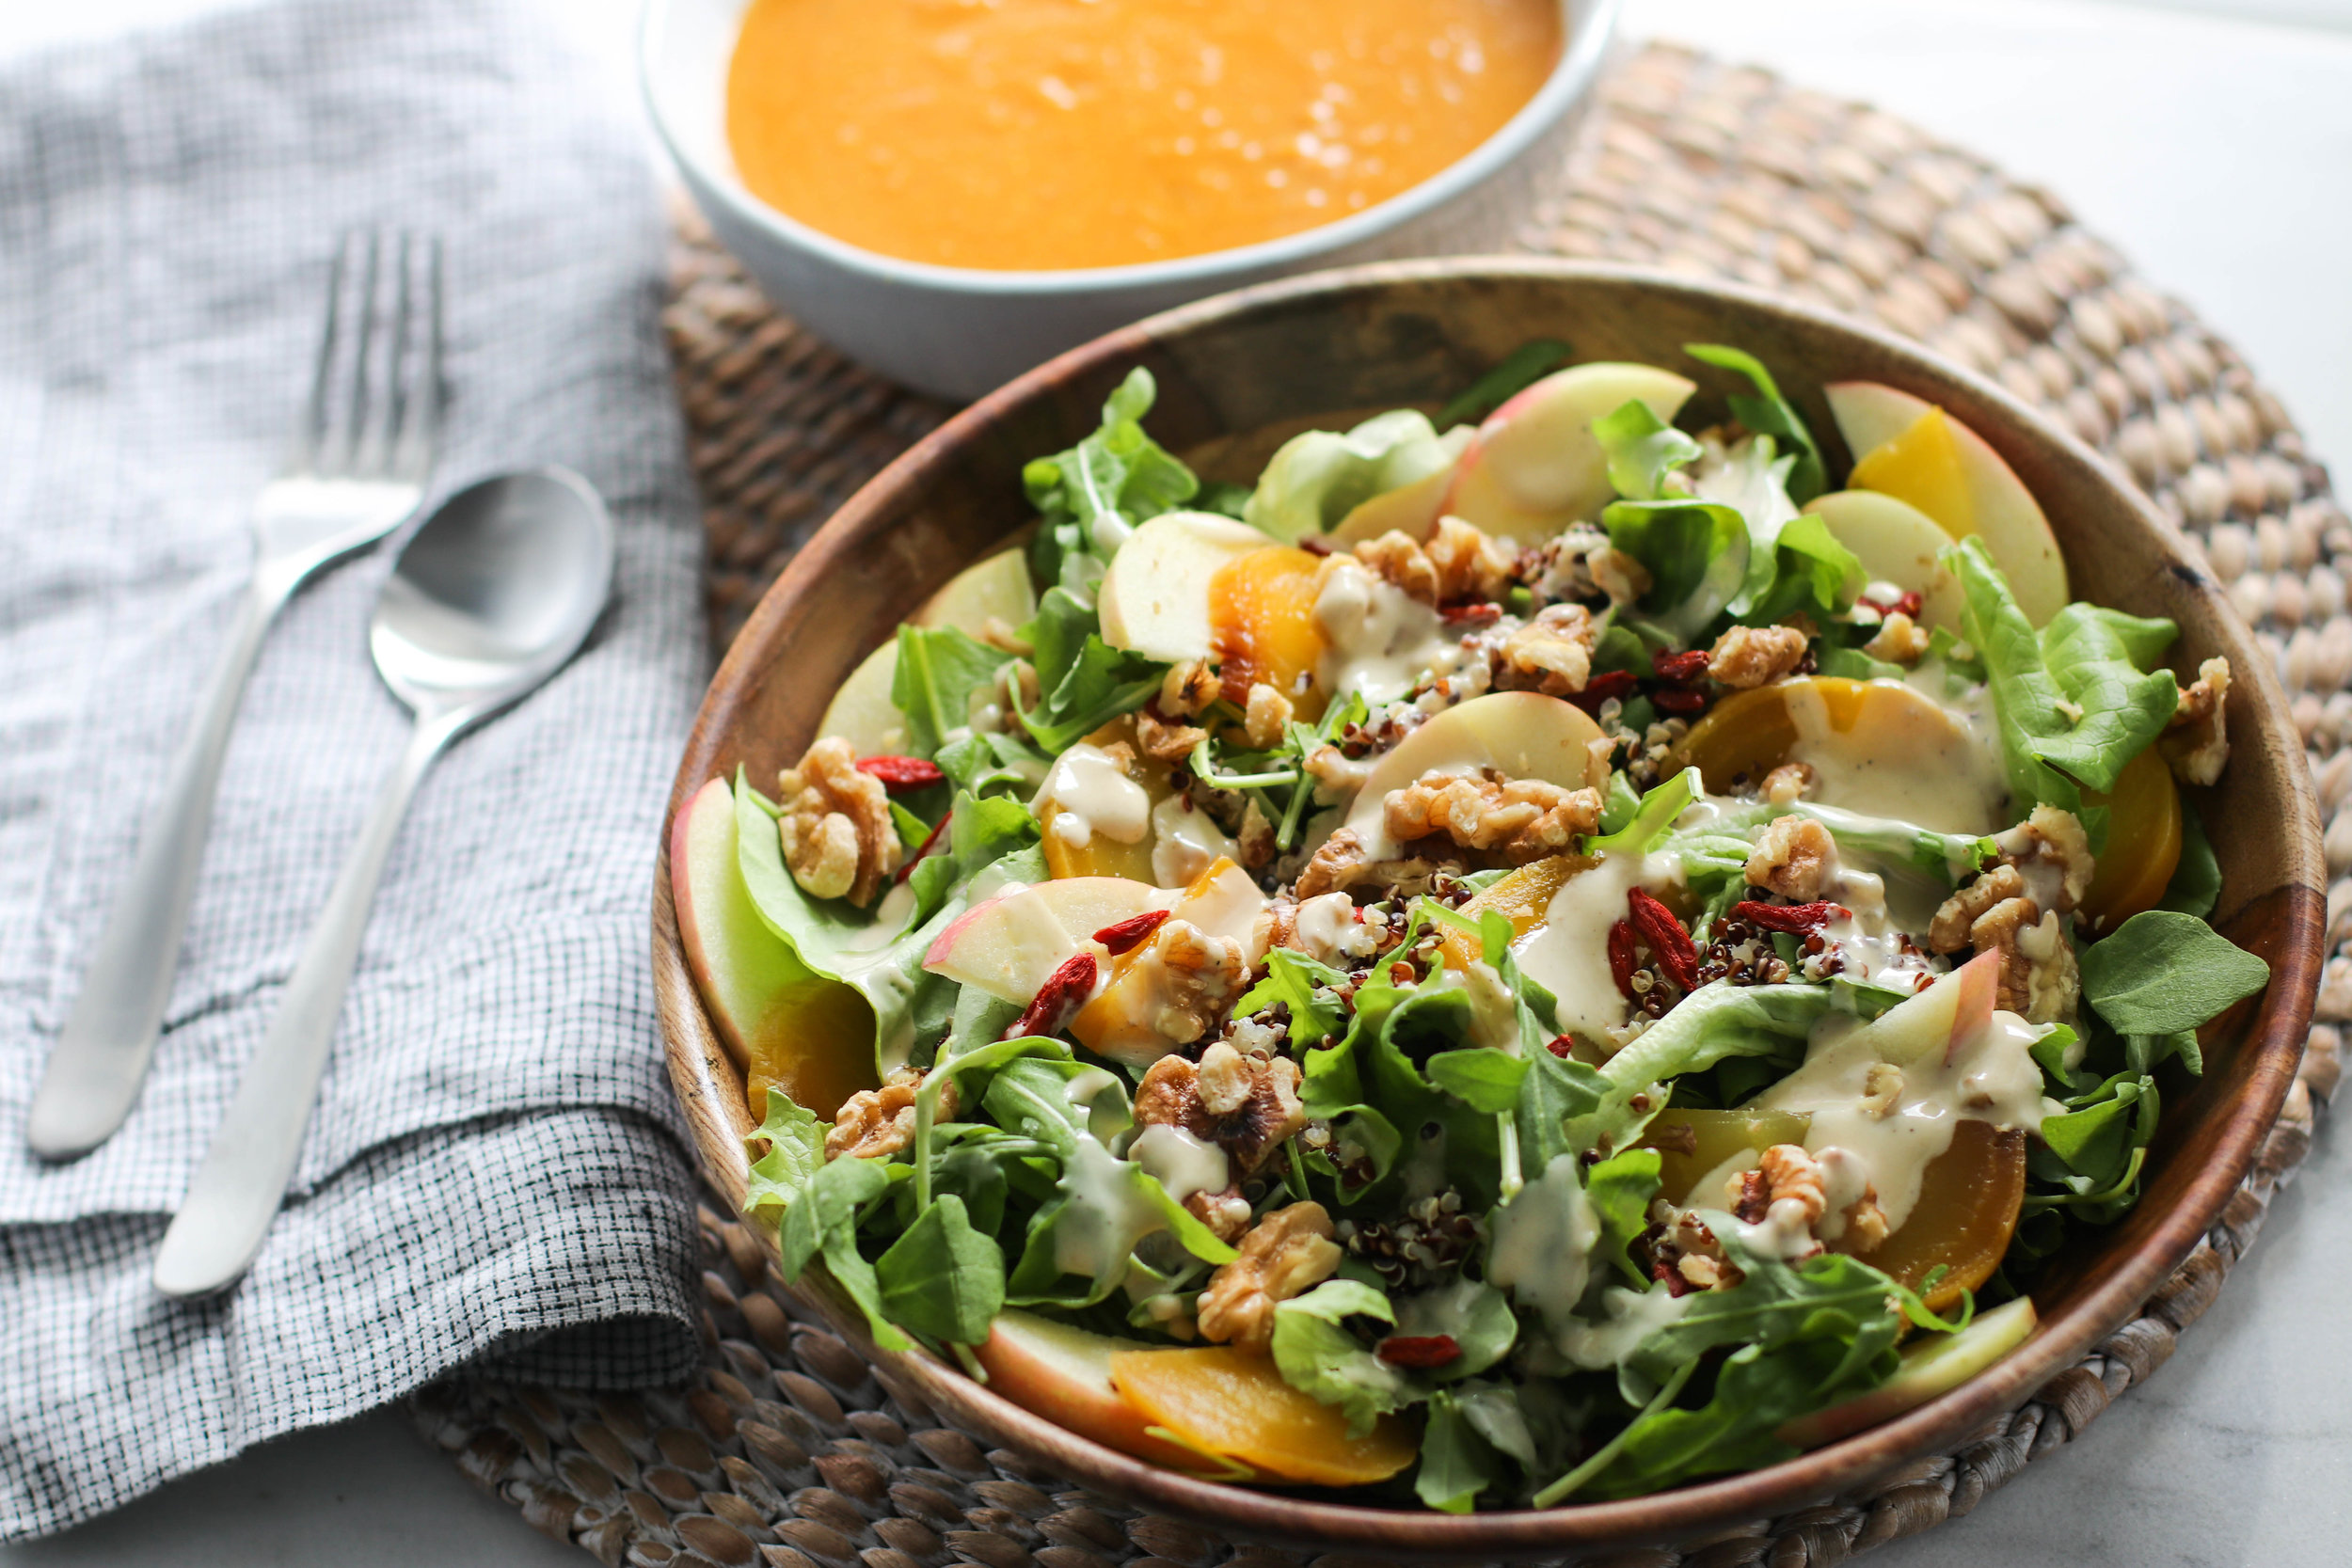 Maple Tahini Dressing_Apple Beet Salad_Pantry Lentil Soup 3.jpg